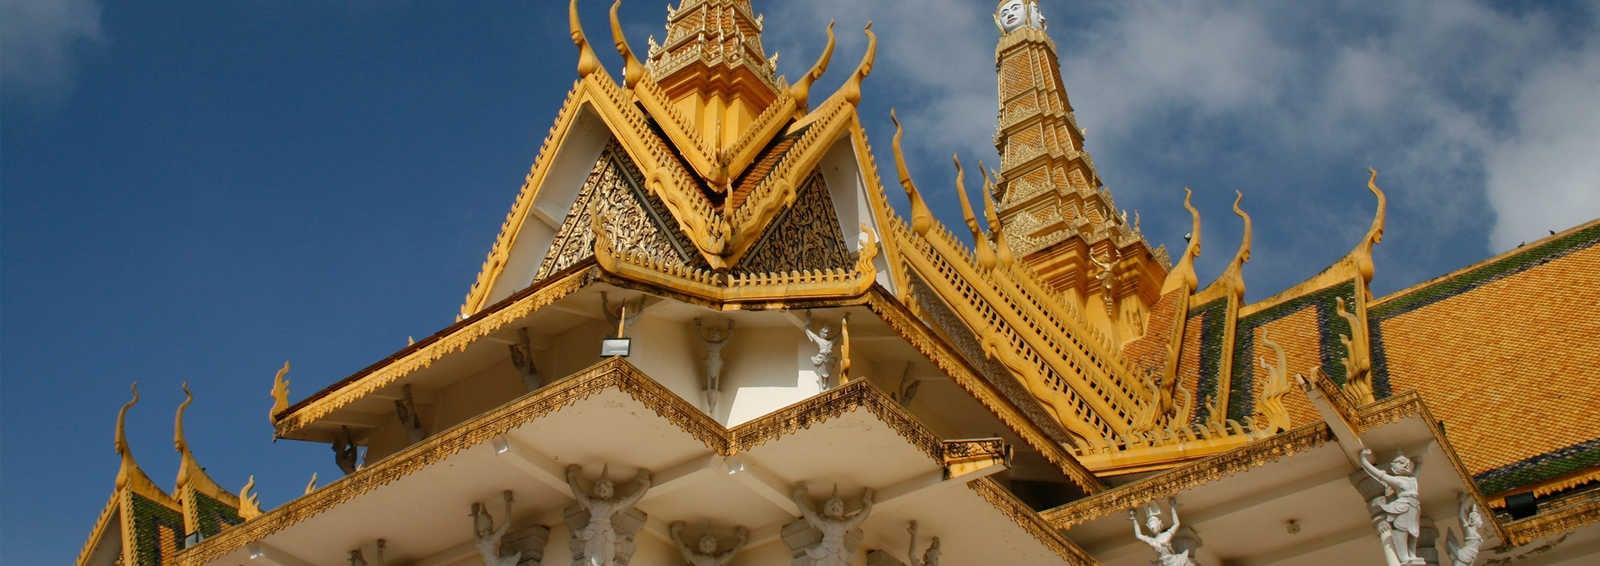 The Royal Palace and Temples, Phnom Penh, Cambodia